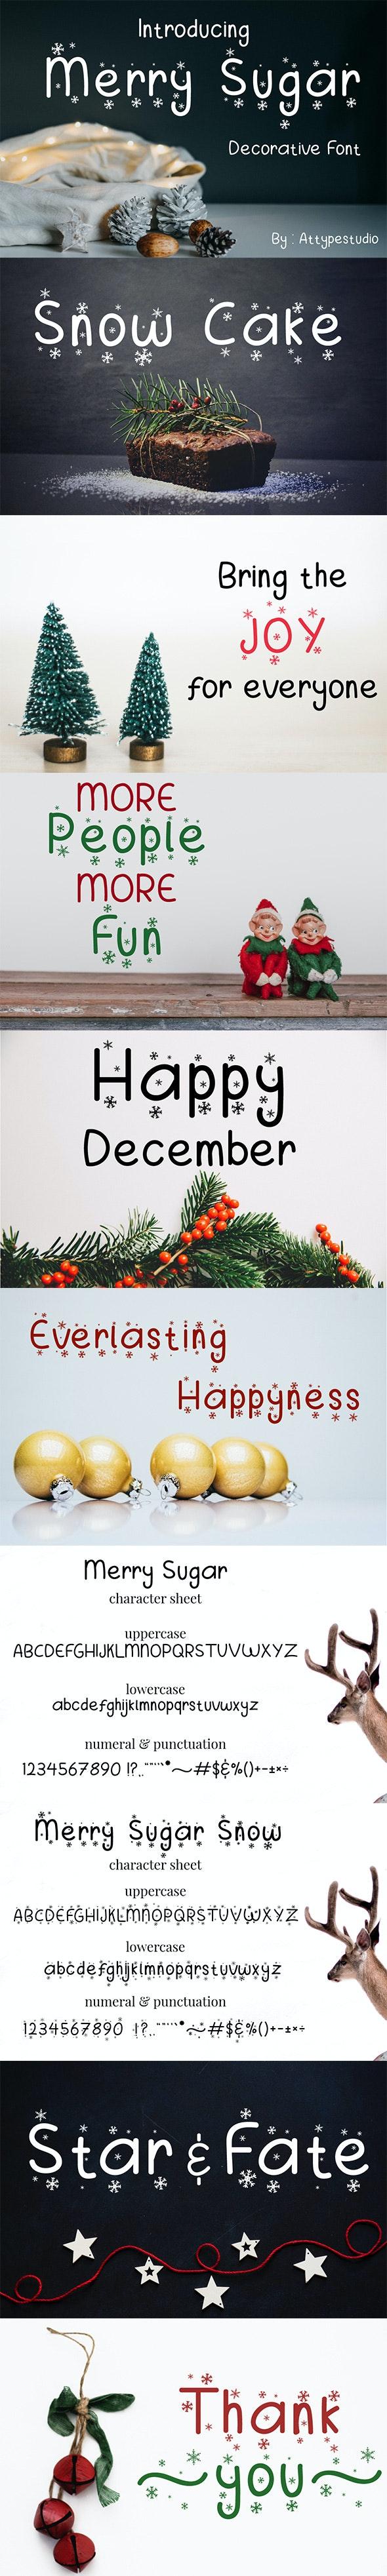 Merry Sugar - Holiday Decorative